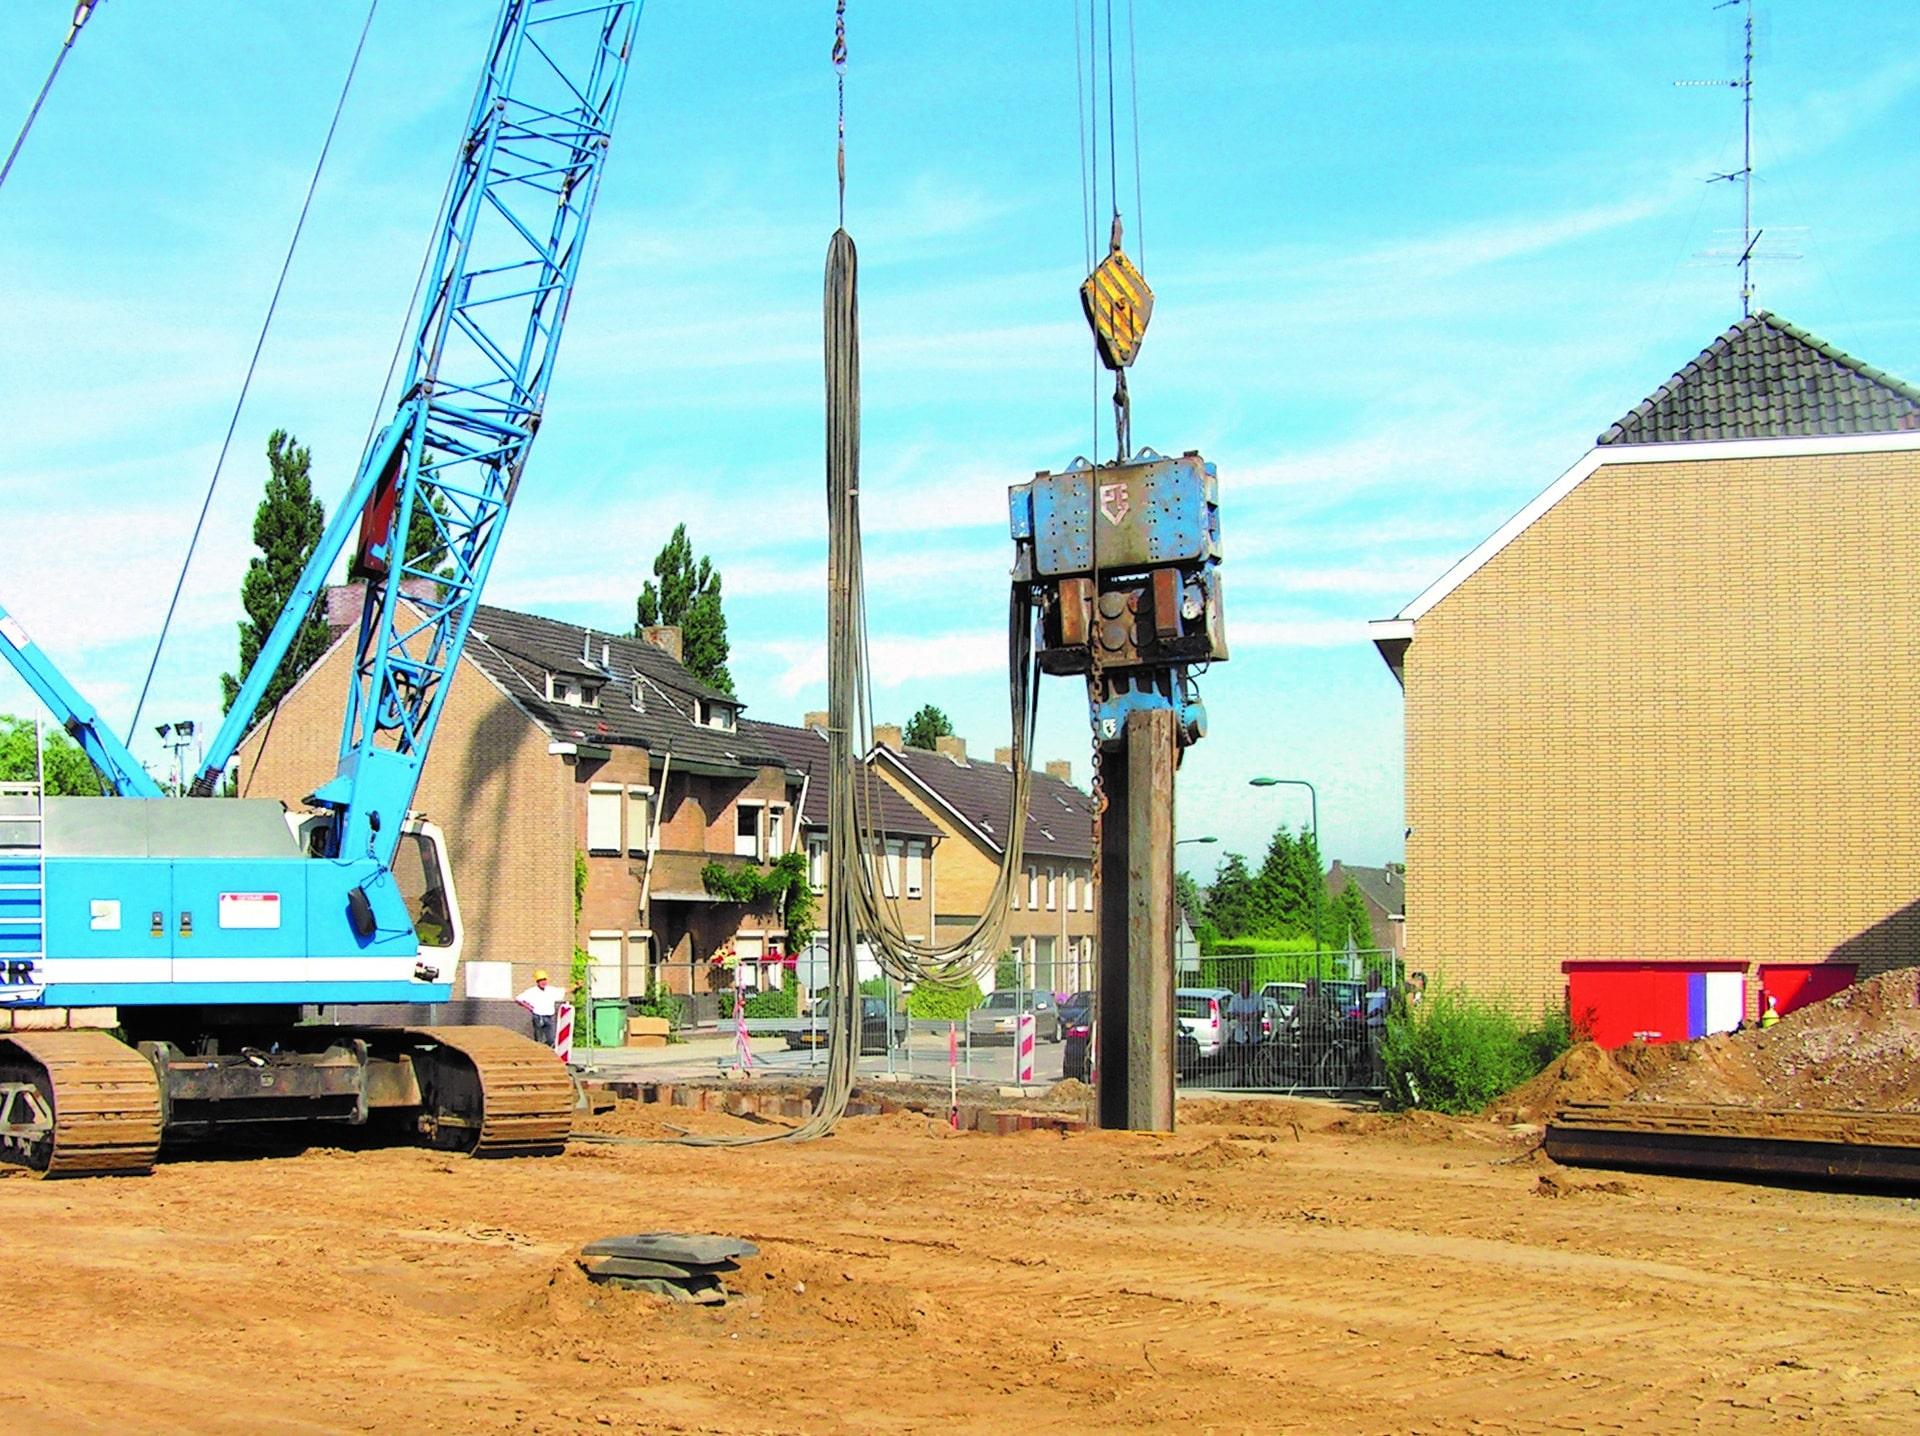 Omgaan met bouwlawaai omwonenden | DGMR